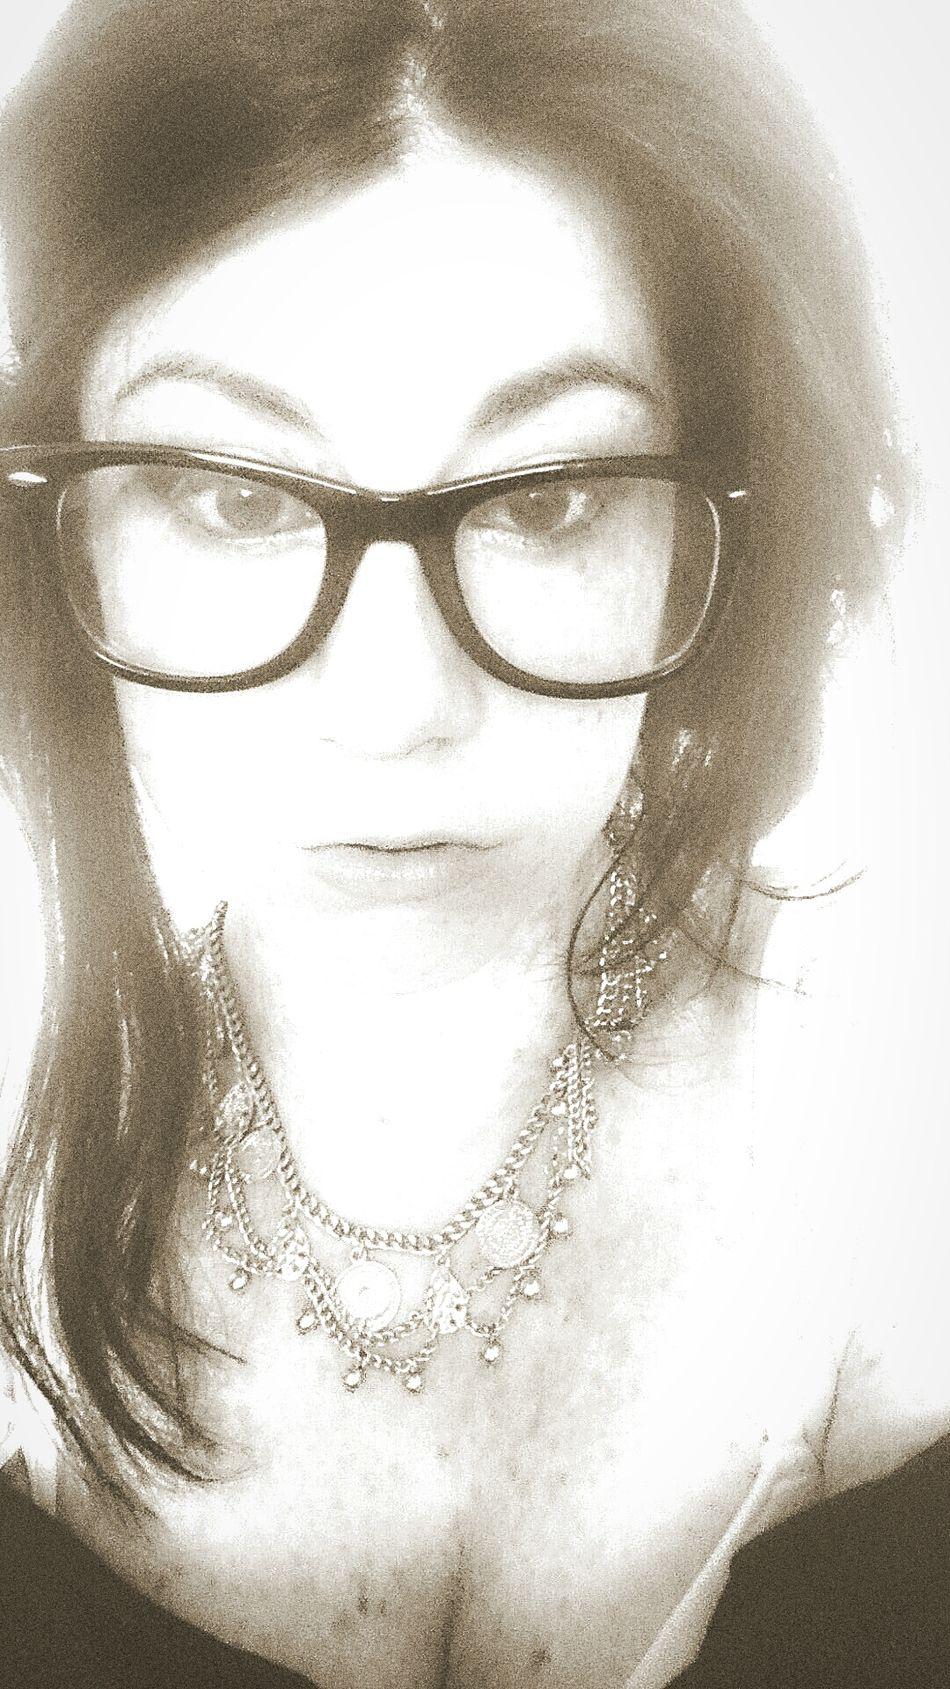 Hotnerdygirl Hotgirl B&w Photography OpenEdit Freckles Freckleseverywhere Selfportrait KAWAII My Nerd Glasses Photooftheday